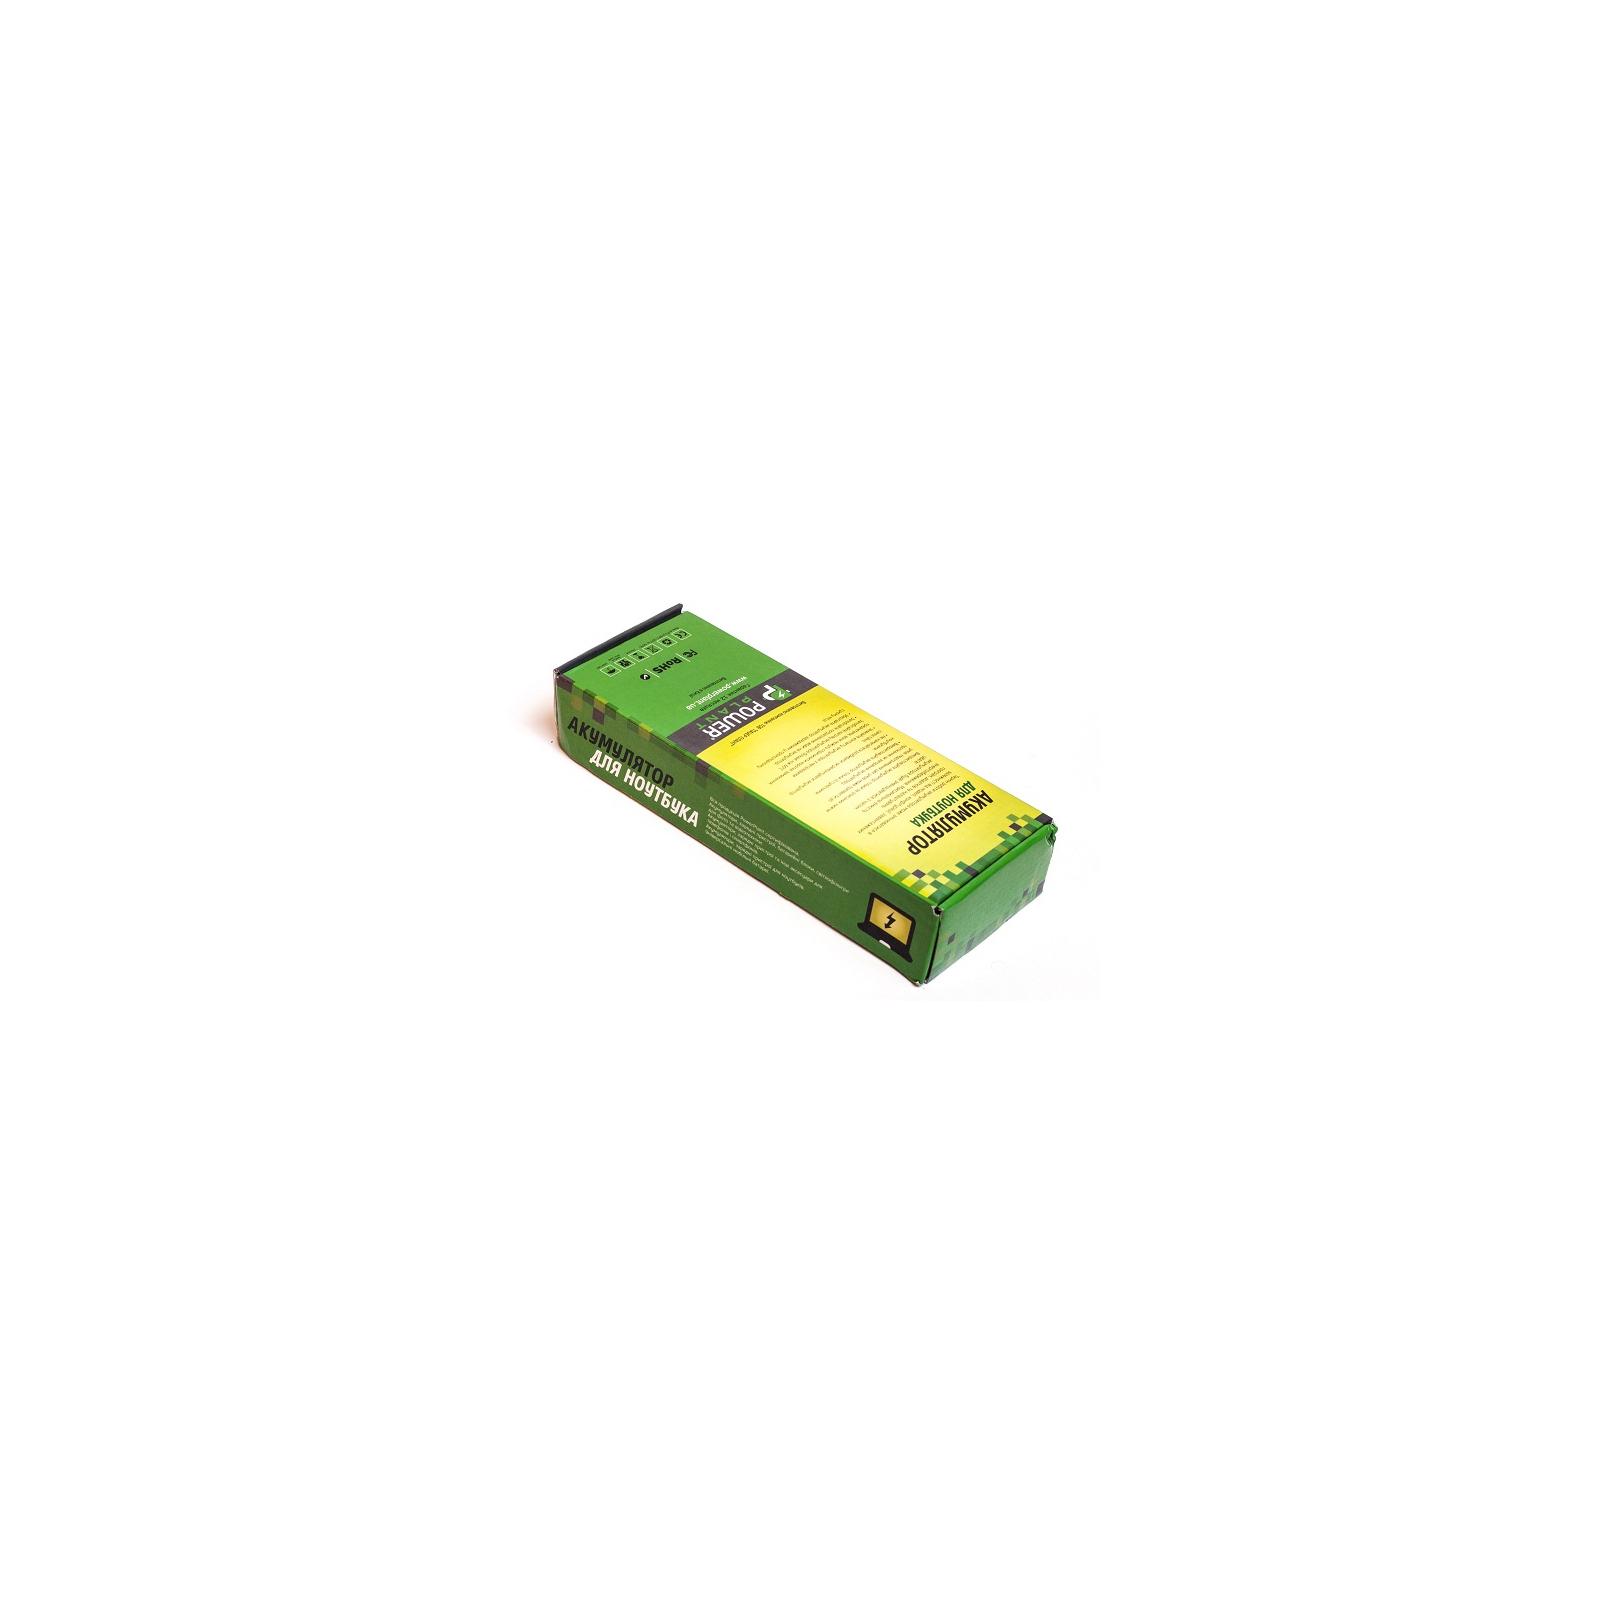 Аккумулятор для ноутбука HP DV9000 (HSTNN-LB33, H90001LH) 14.4V 5200mAh PowerPlant (NB00000128) изображение 2